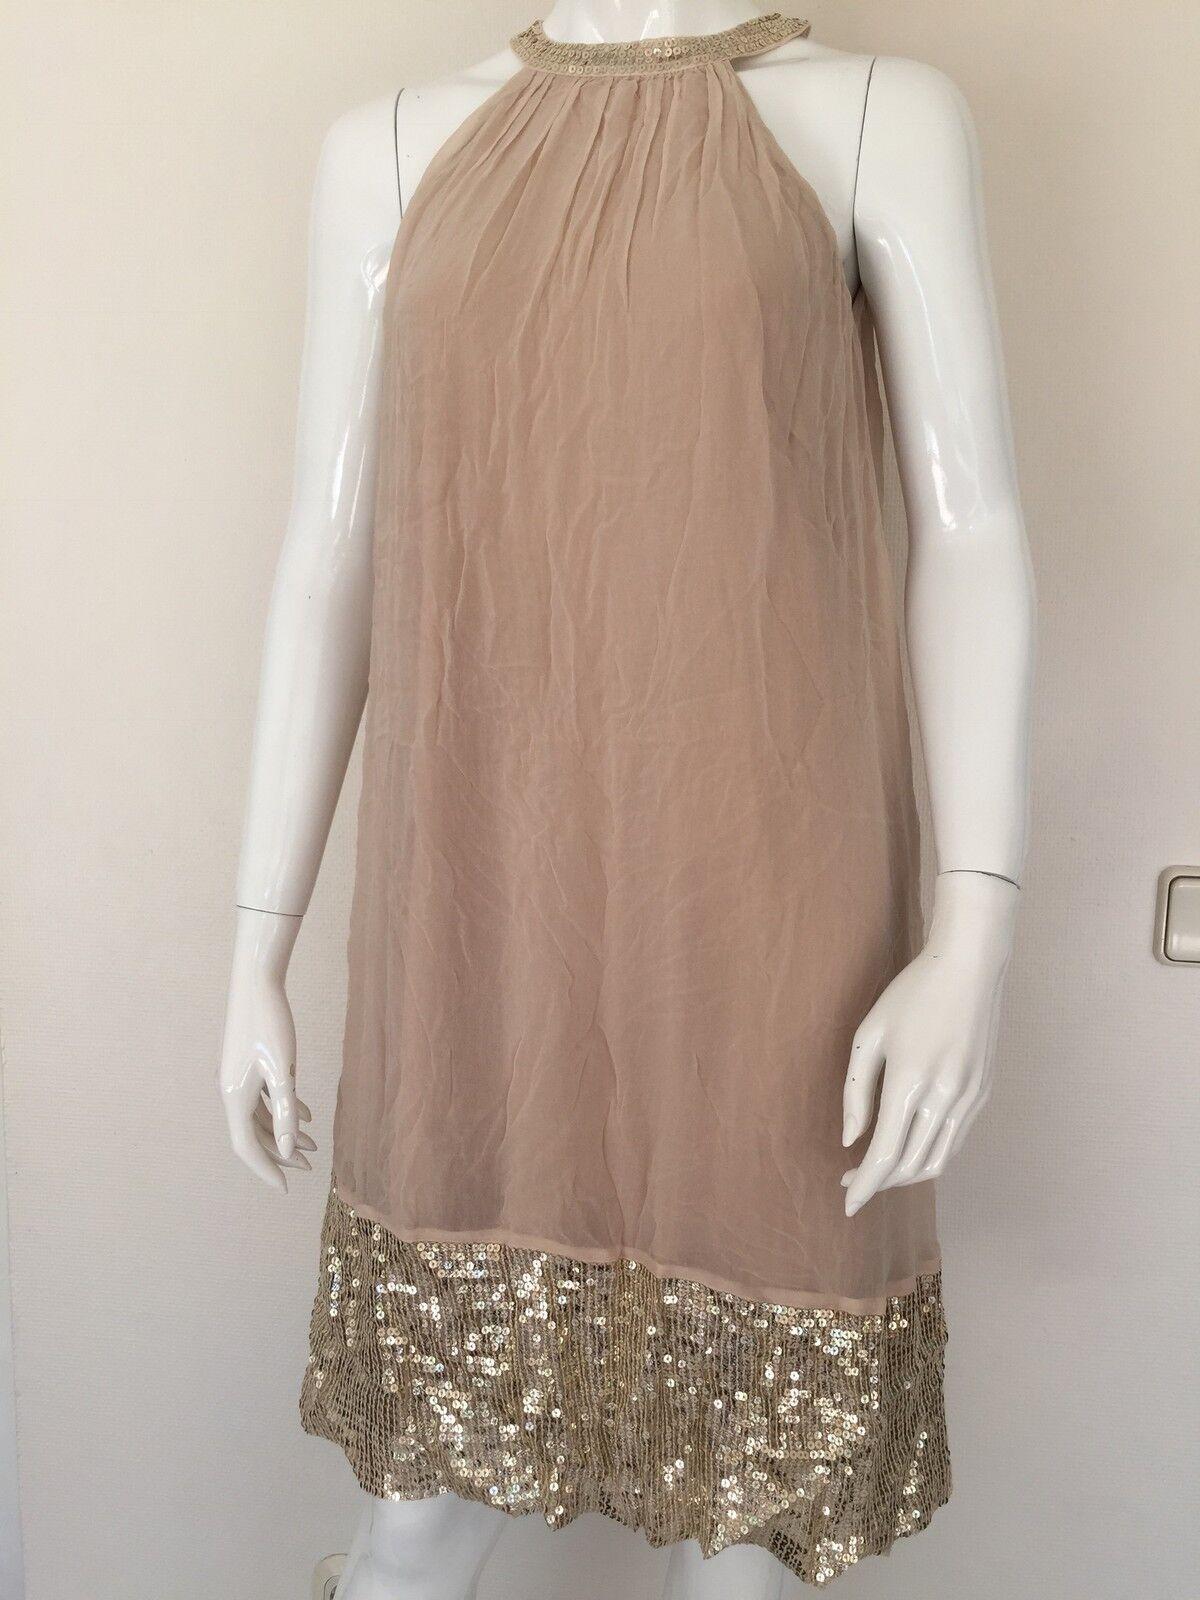 Mellow Peach Kleid, Hängerchen, Babydoll, Nude, Goldene Pailletten, Traum, 36